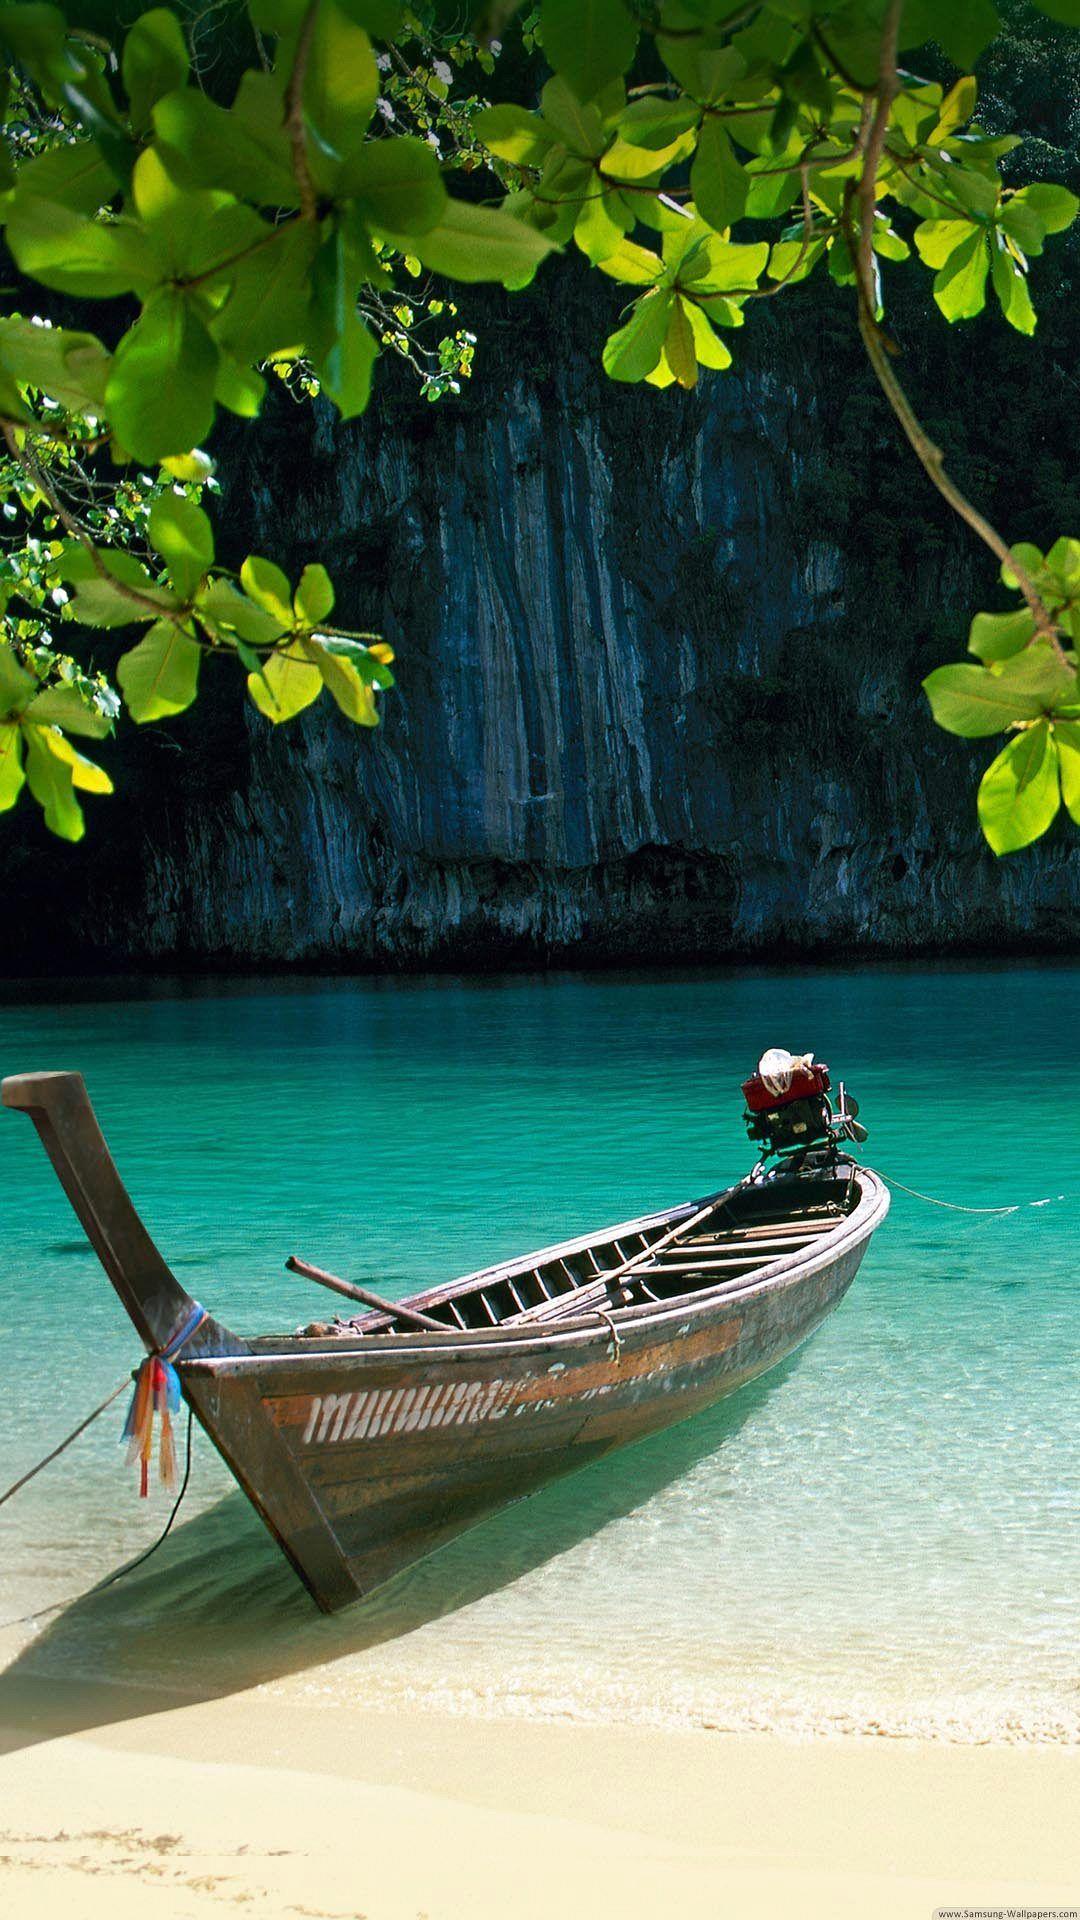 Wallpaper Full Hd 1080 X 1920 Smartphone Paradise Tropical Boat